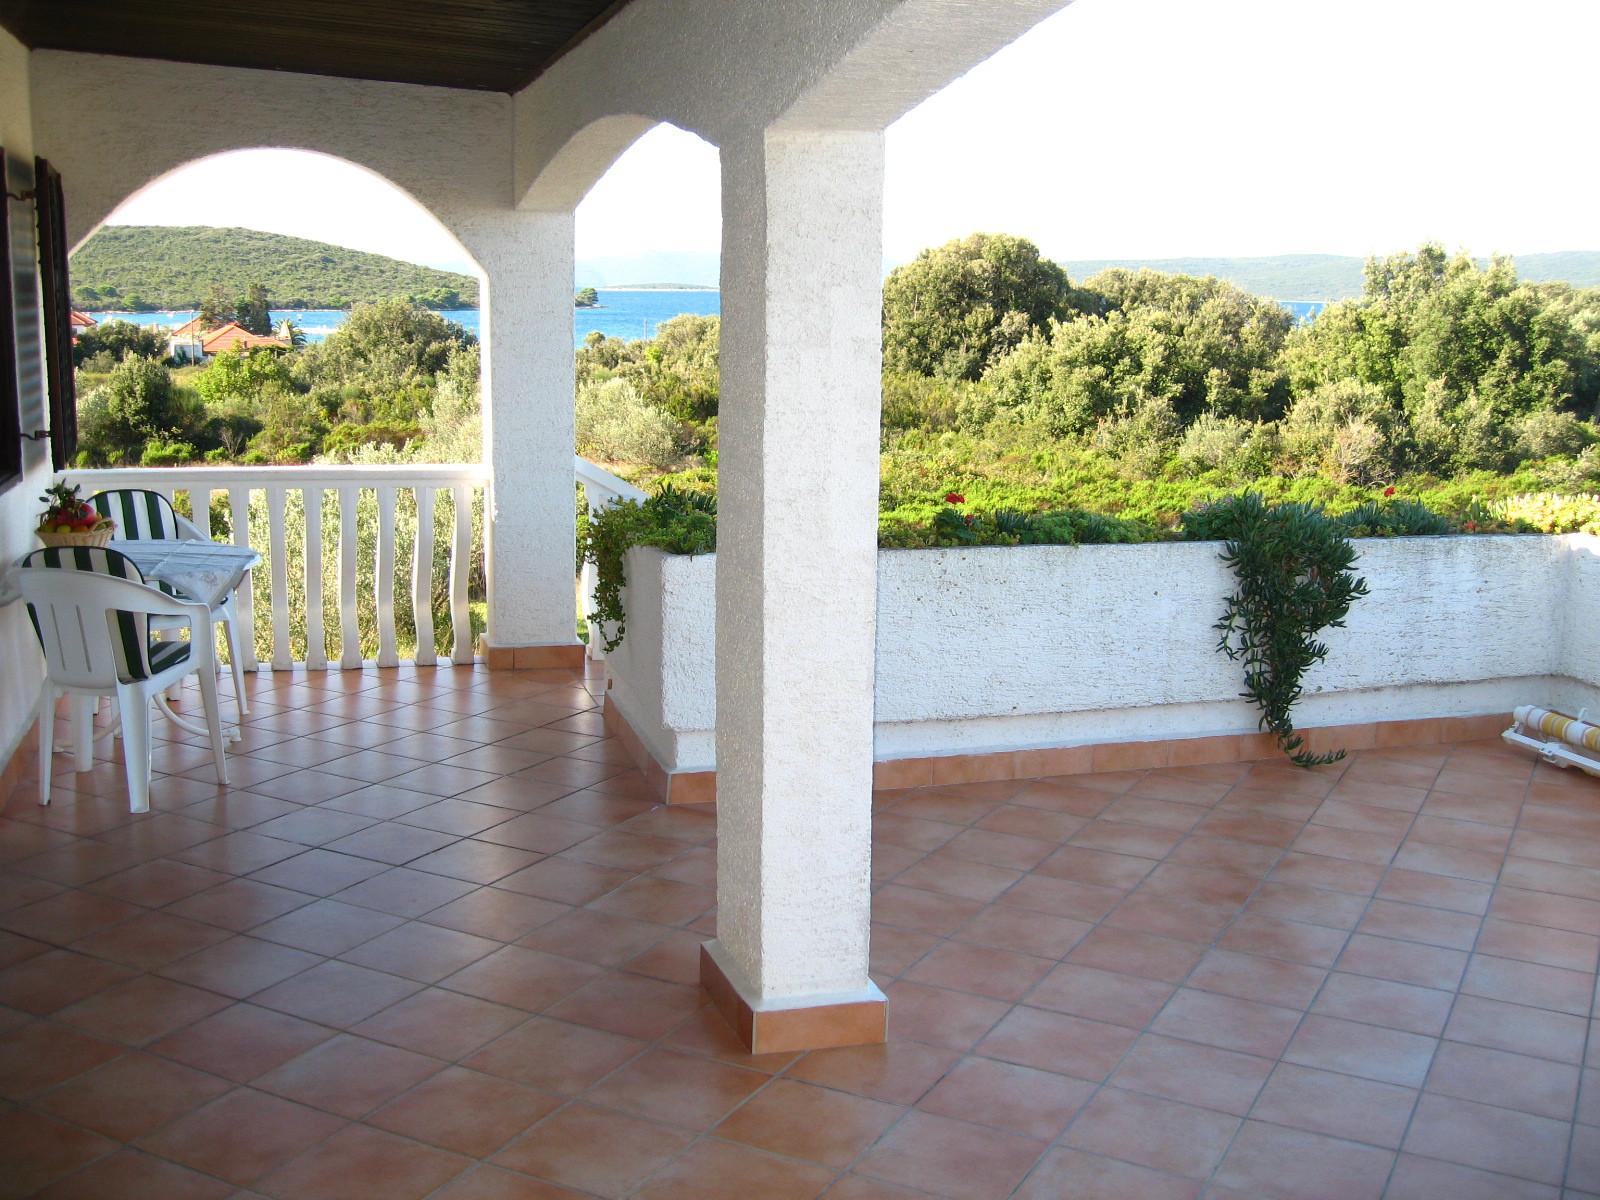 Ferienwohnung Lado SA1(2+1) - Muline (741846), Ugljan, Insel Ugljan, Dalmatien, Kroatien, Bild 5